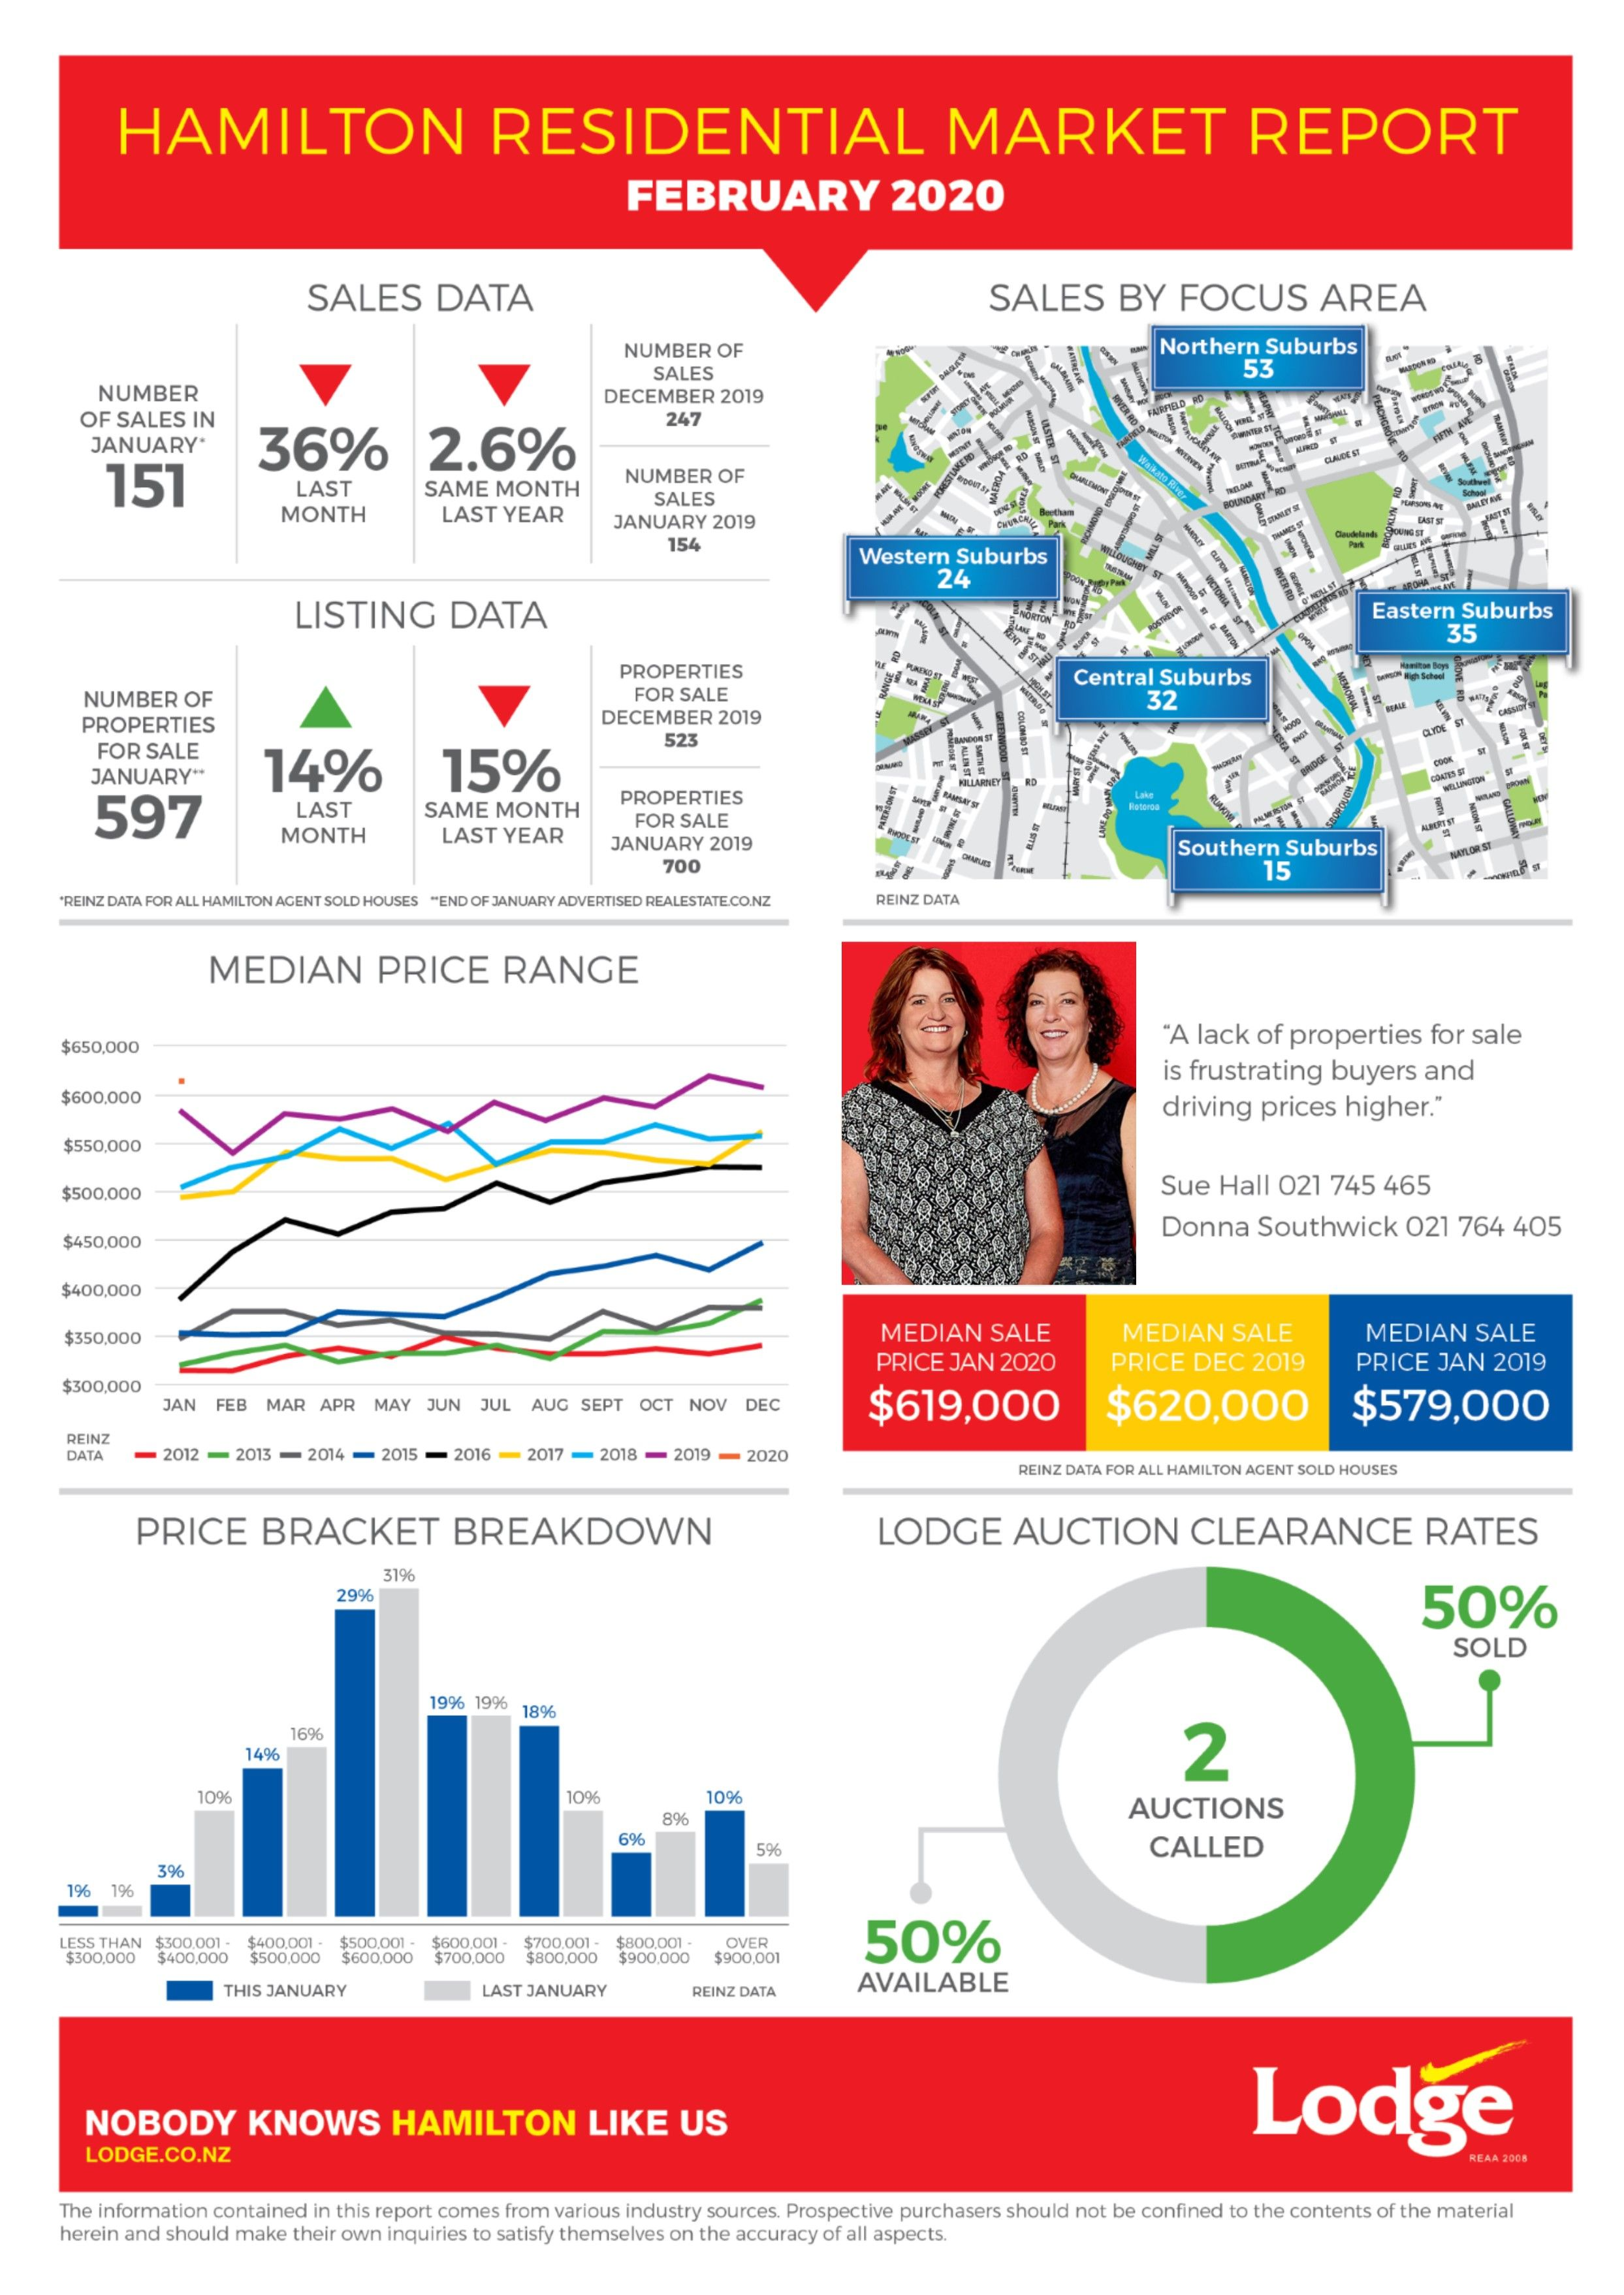 Hamilton Residential Market Report February 2020 in 2020